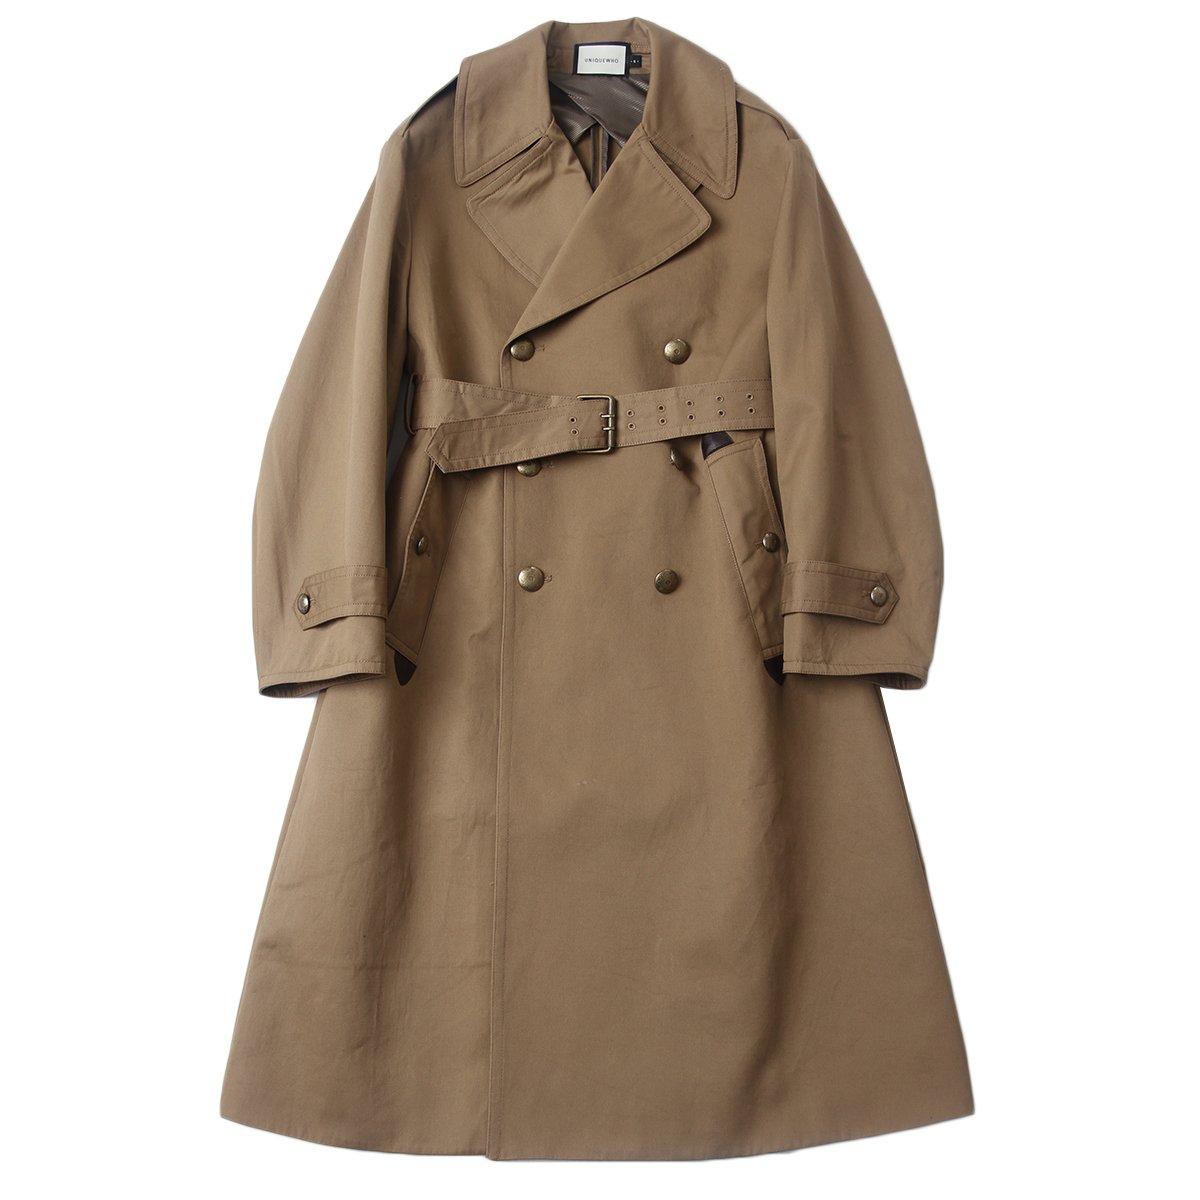 UNIQUEWHO Women's Classic Cotton Double-Breasted Midi-Length Trench Coat Color Dark Khaki (S)